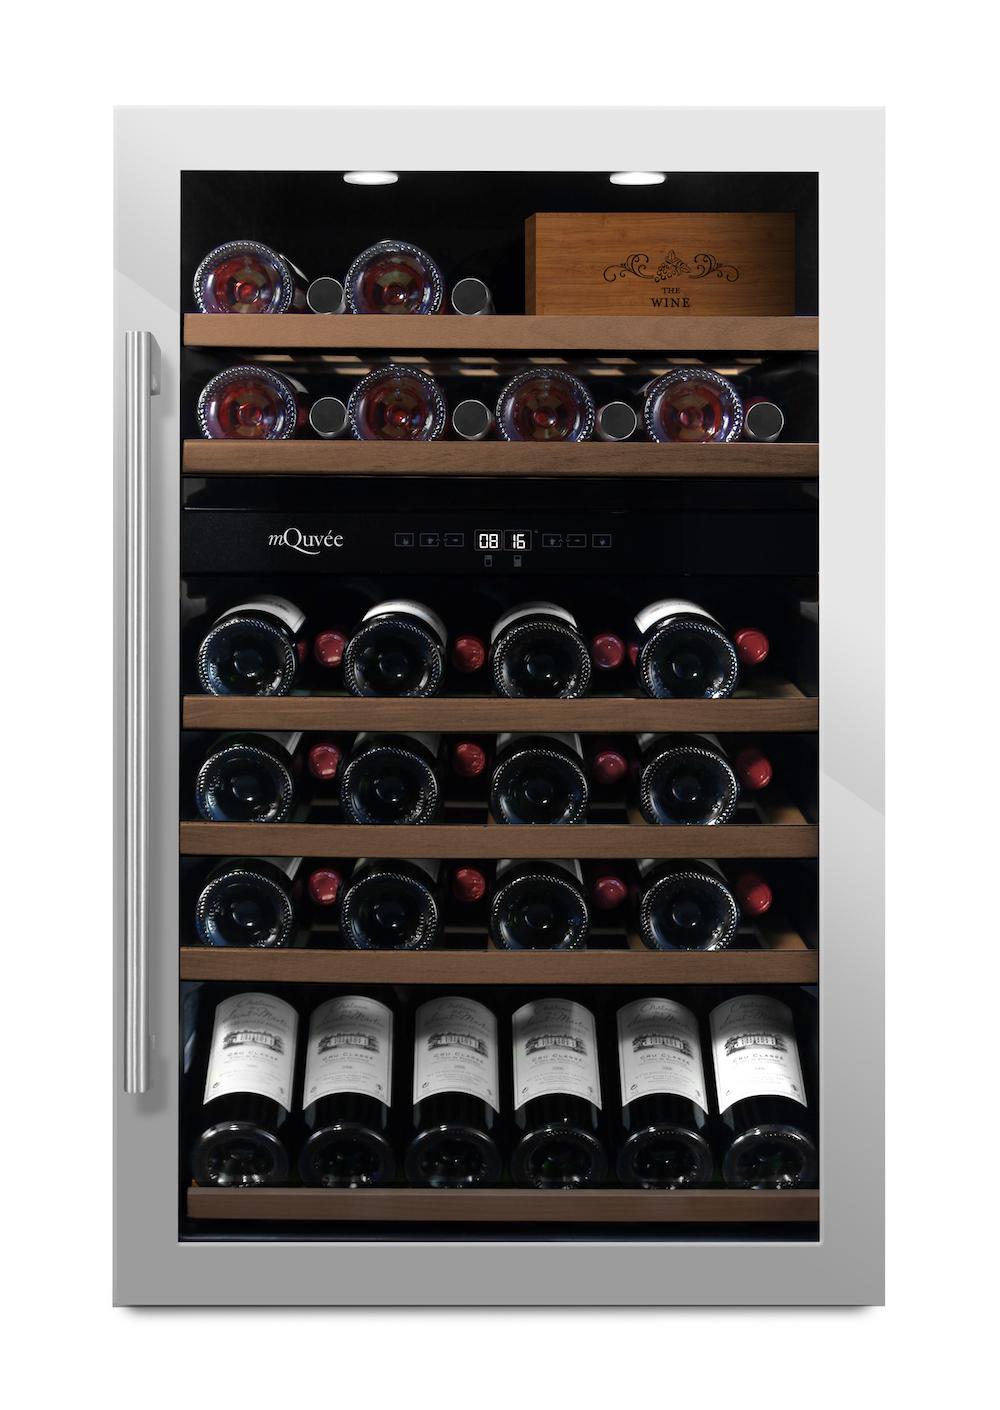 mQuvée - rostfri fristående vinkyl - rymmer 57 flaskor